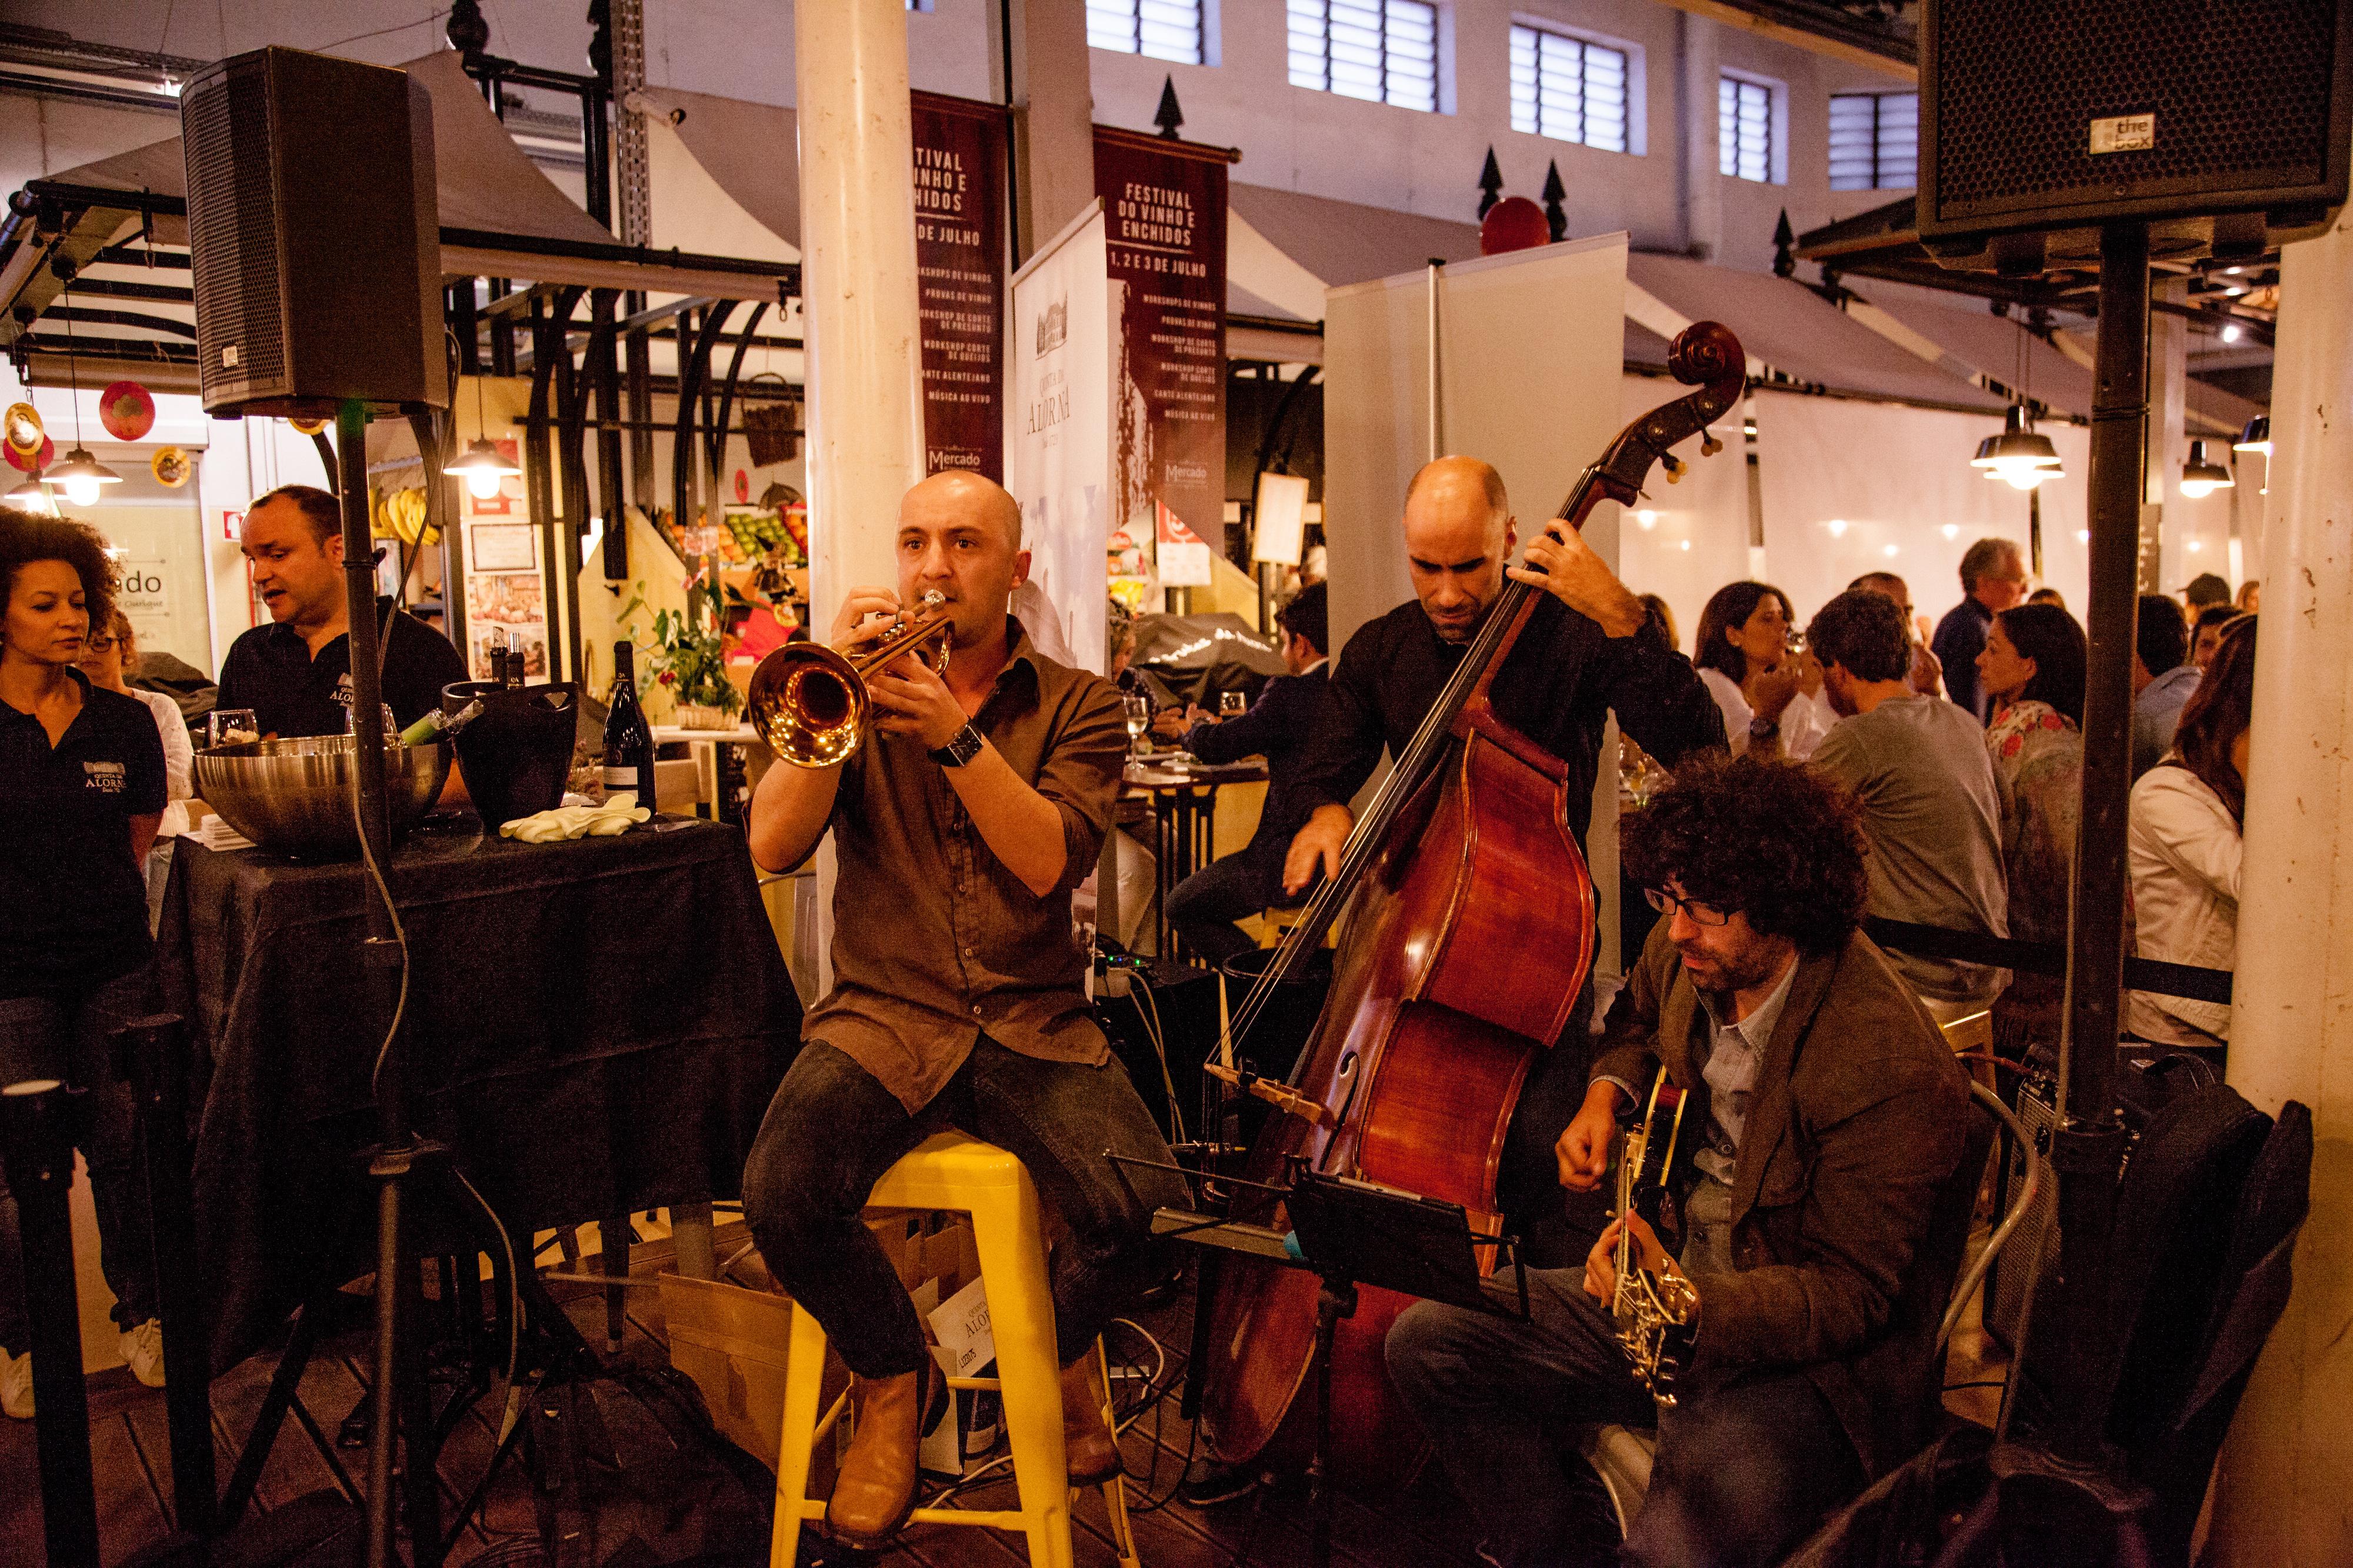 Mercado de Campo de Ourique festeja seis anos e propõe-nos música e comeres